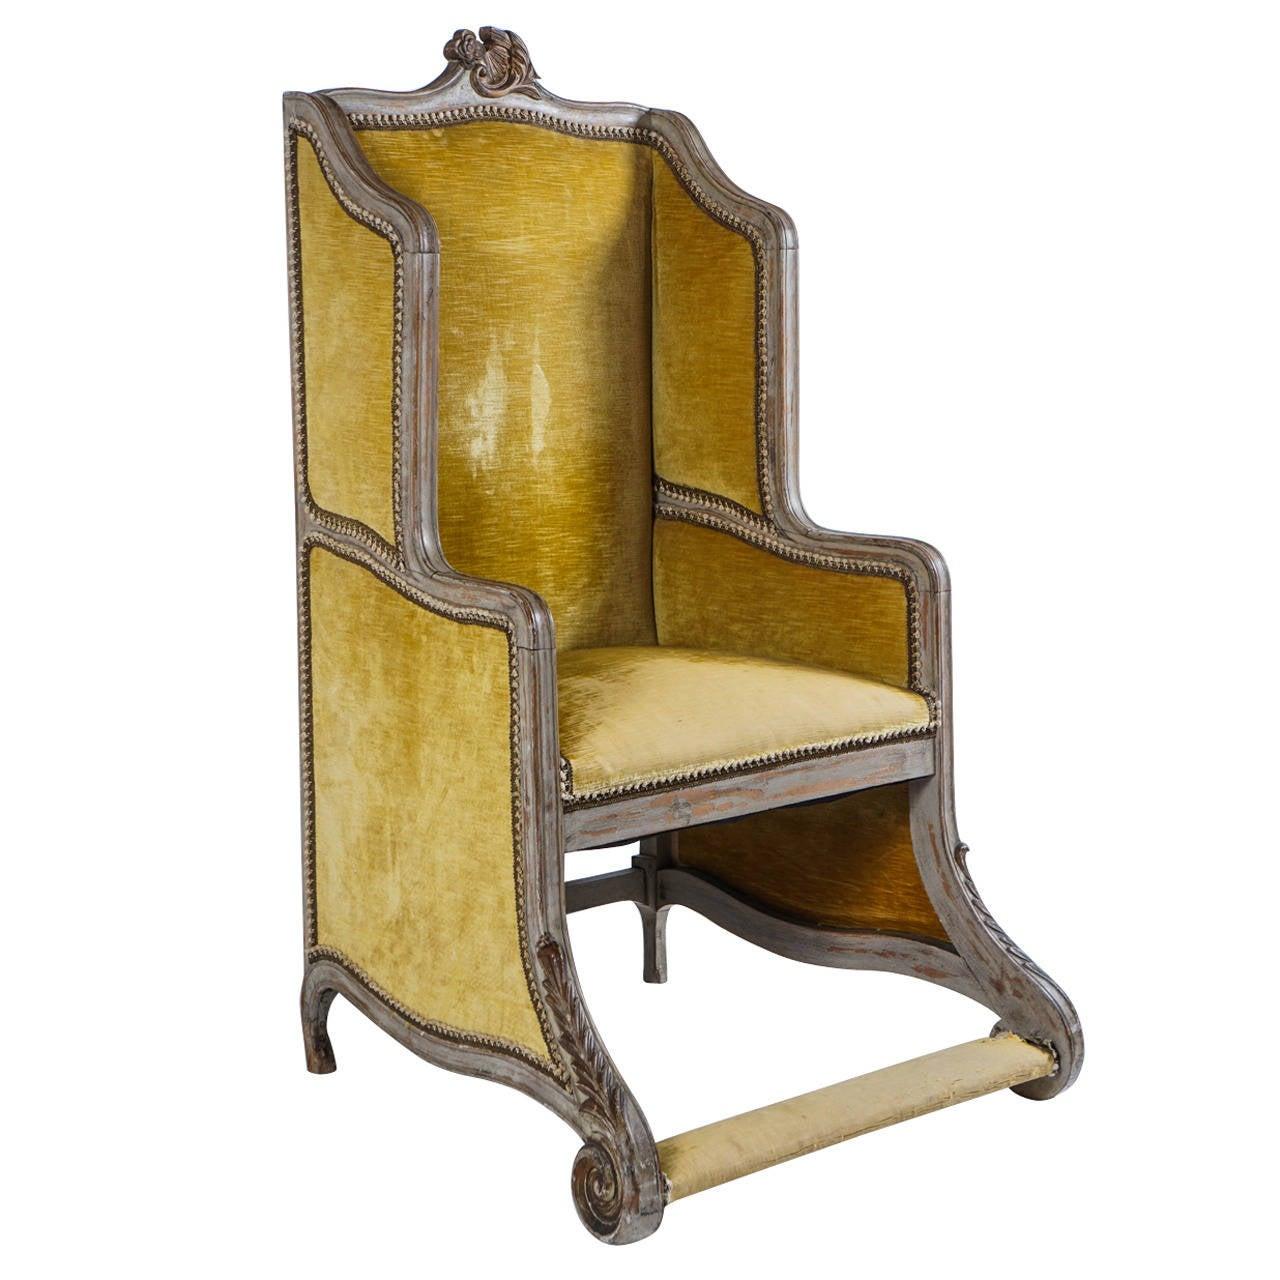 Louis XV Style Chaise de Chausseur, France, circa 1890